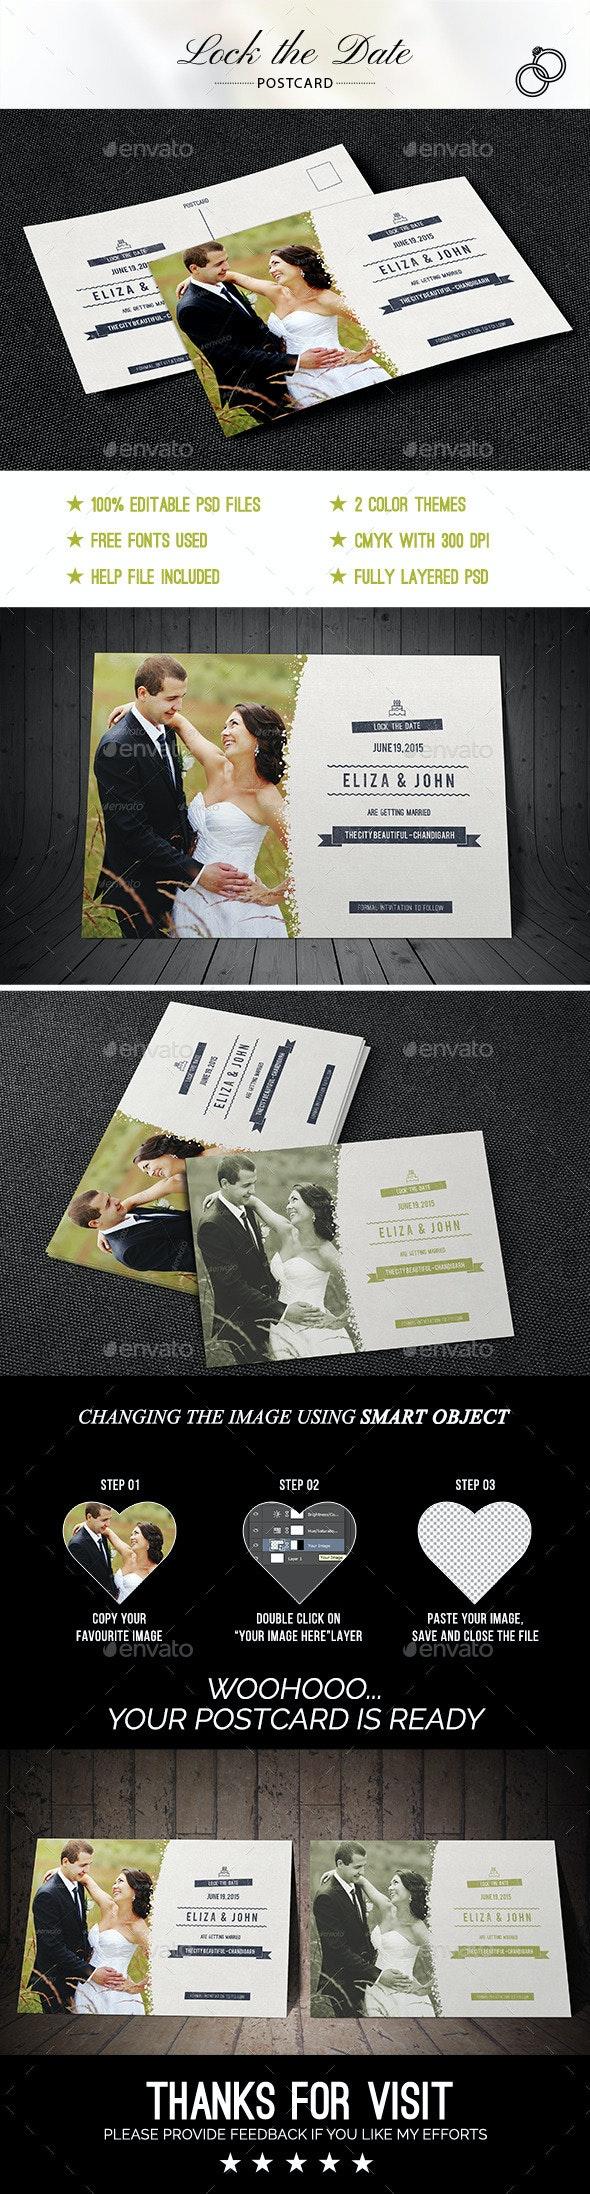 WEDDING Postcard - Invitations Cards & Invites